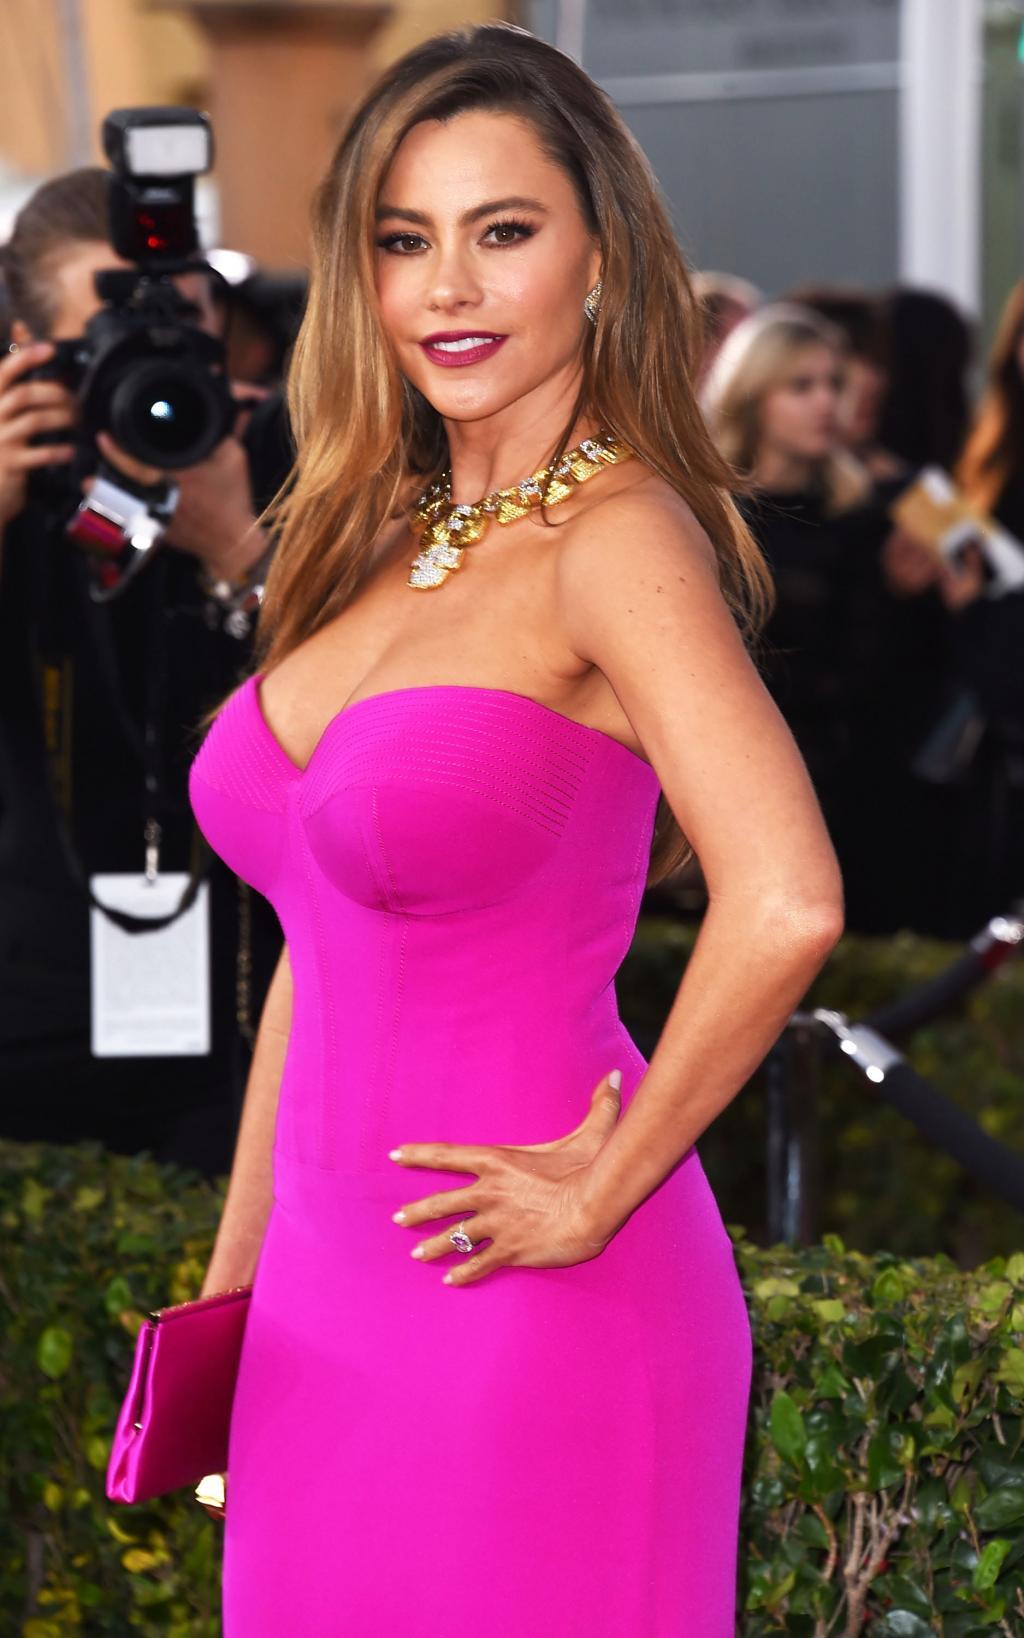 Sofia Vergara Admits Red Carpet Dresses Are Super Uncomfortable Due